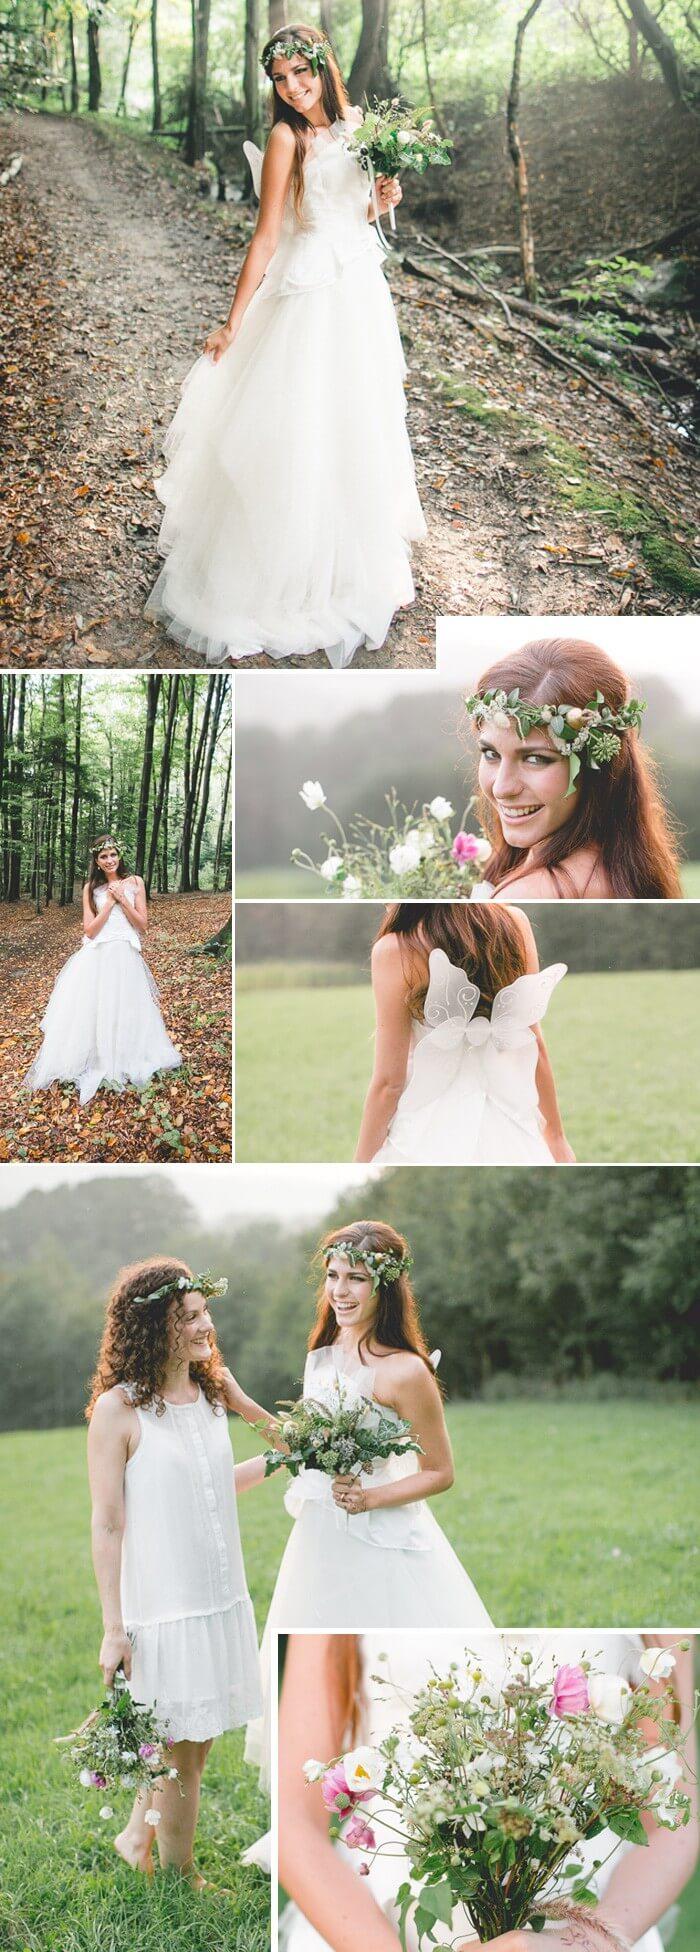 Waldfee im Brautlook